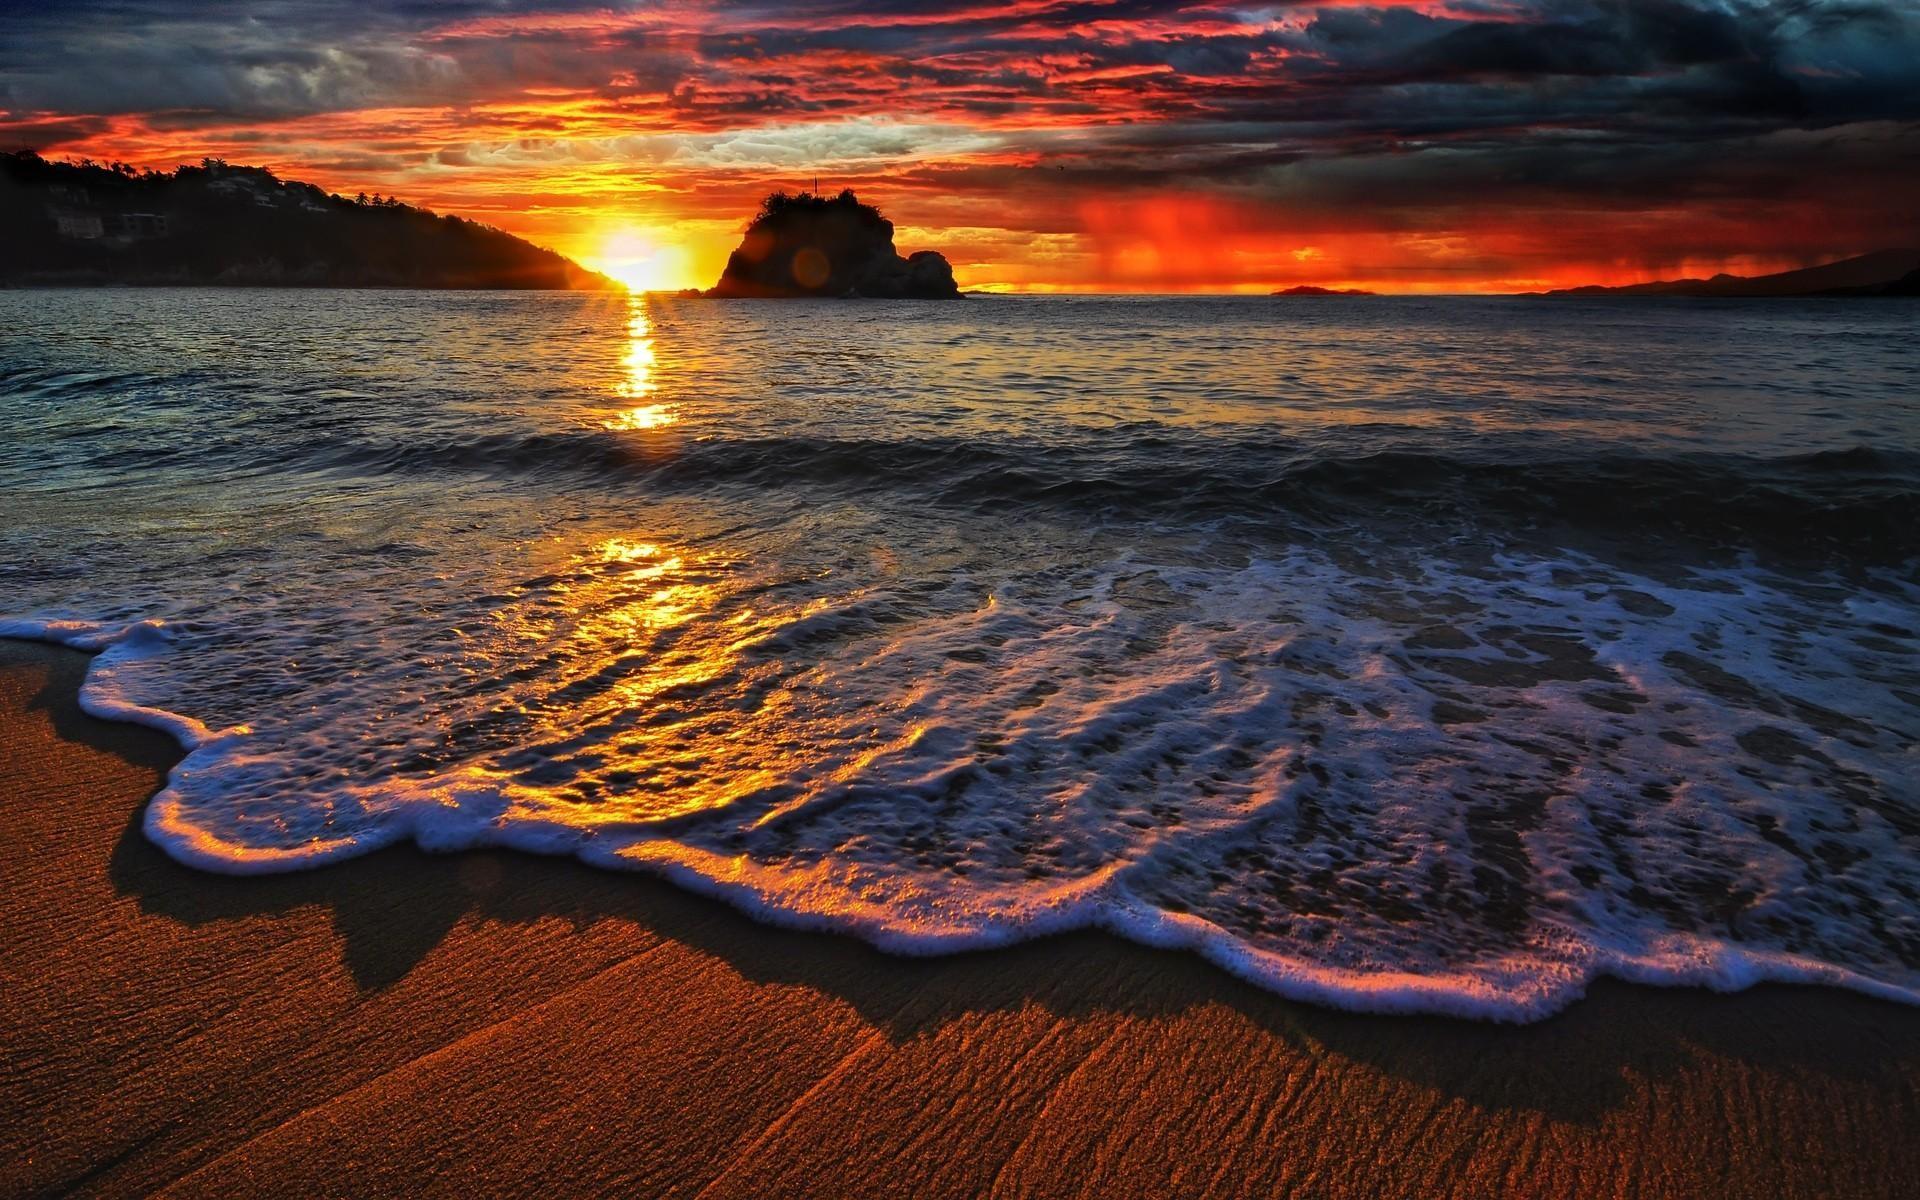 Res: 1920x1200, ocean sunset wallpaper #862663